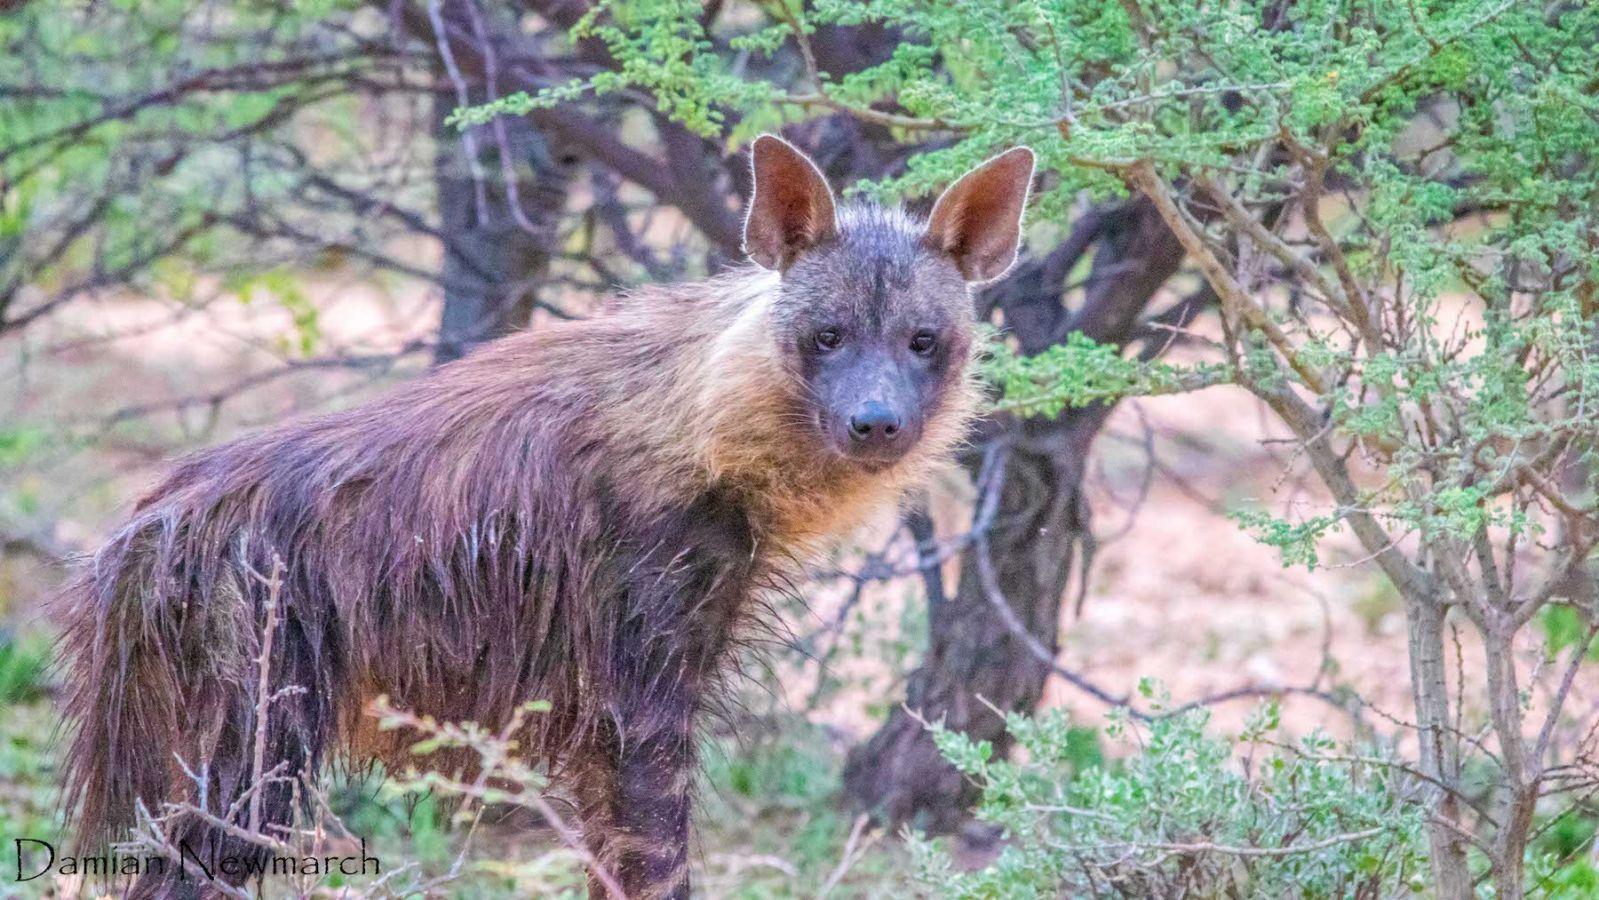 Bruine hyena in Okonjima Nature Reserve